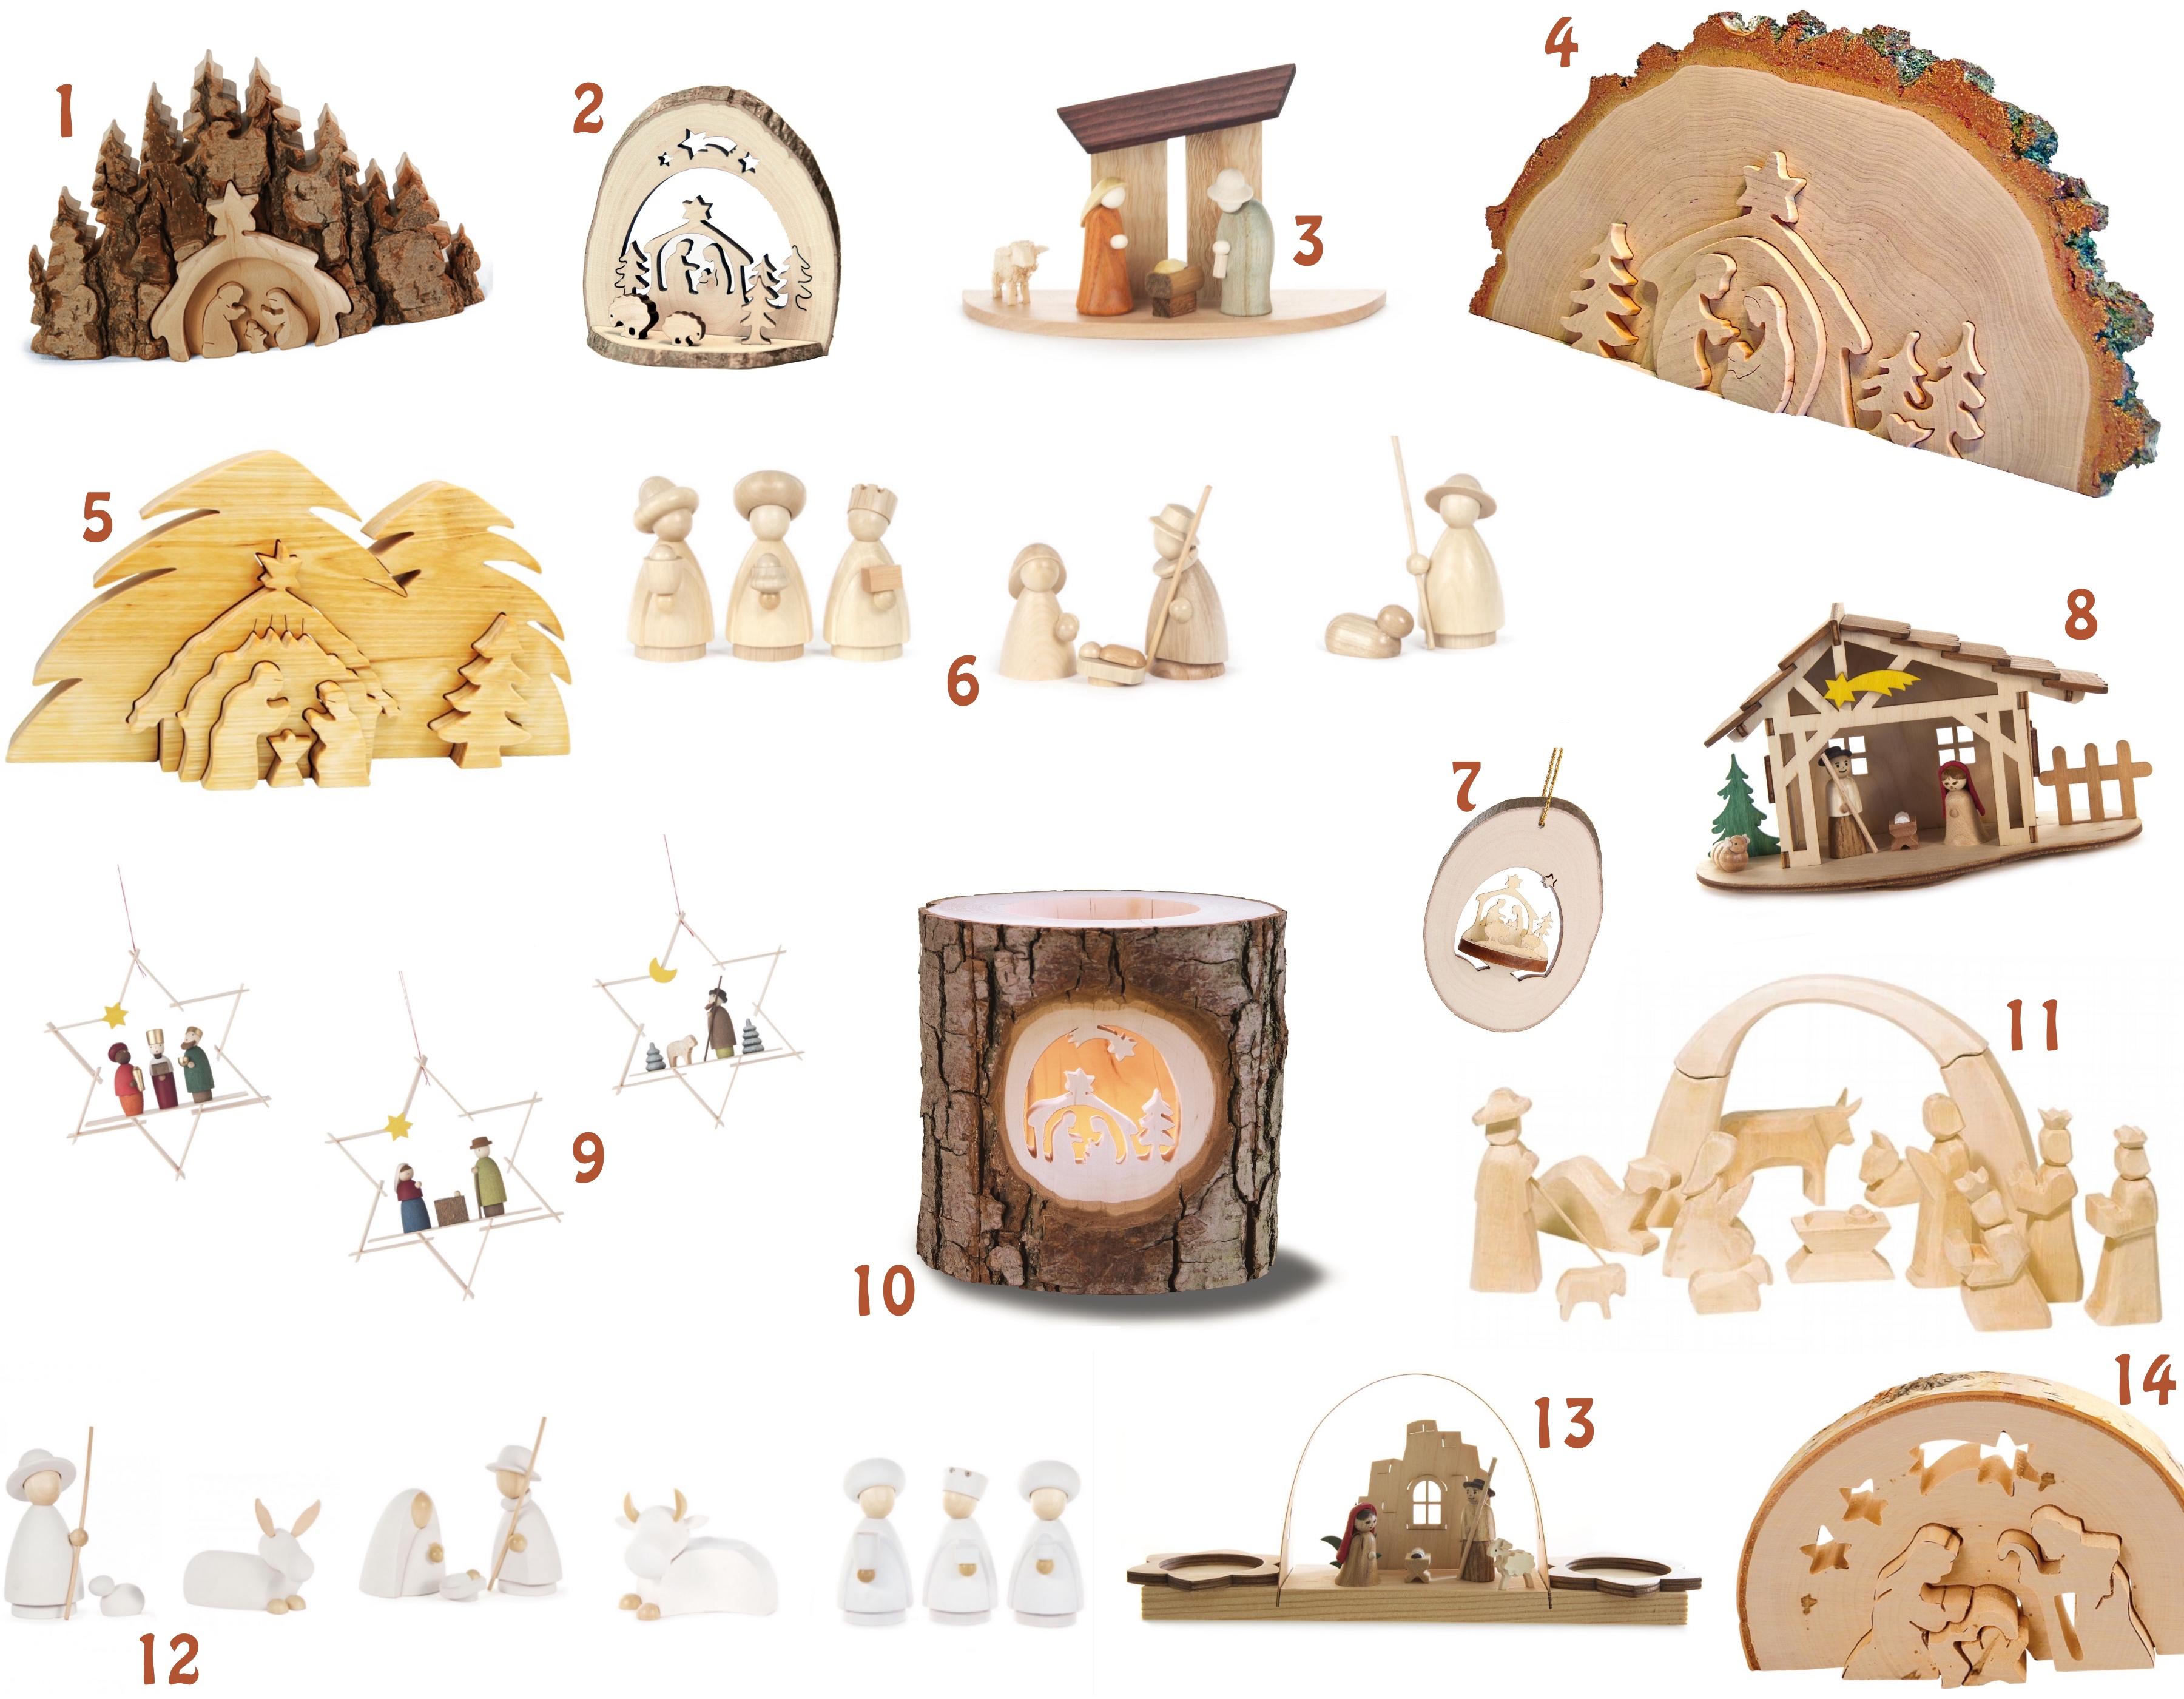 de mooiste houten kerststallen